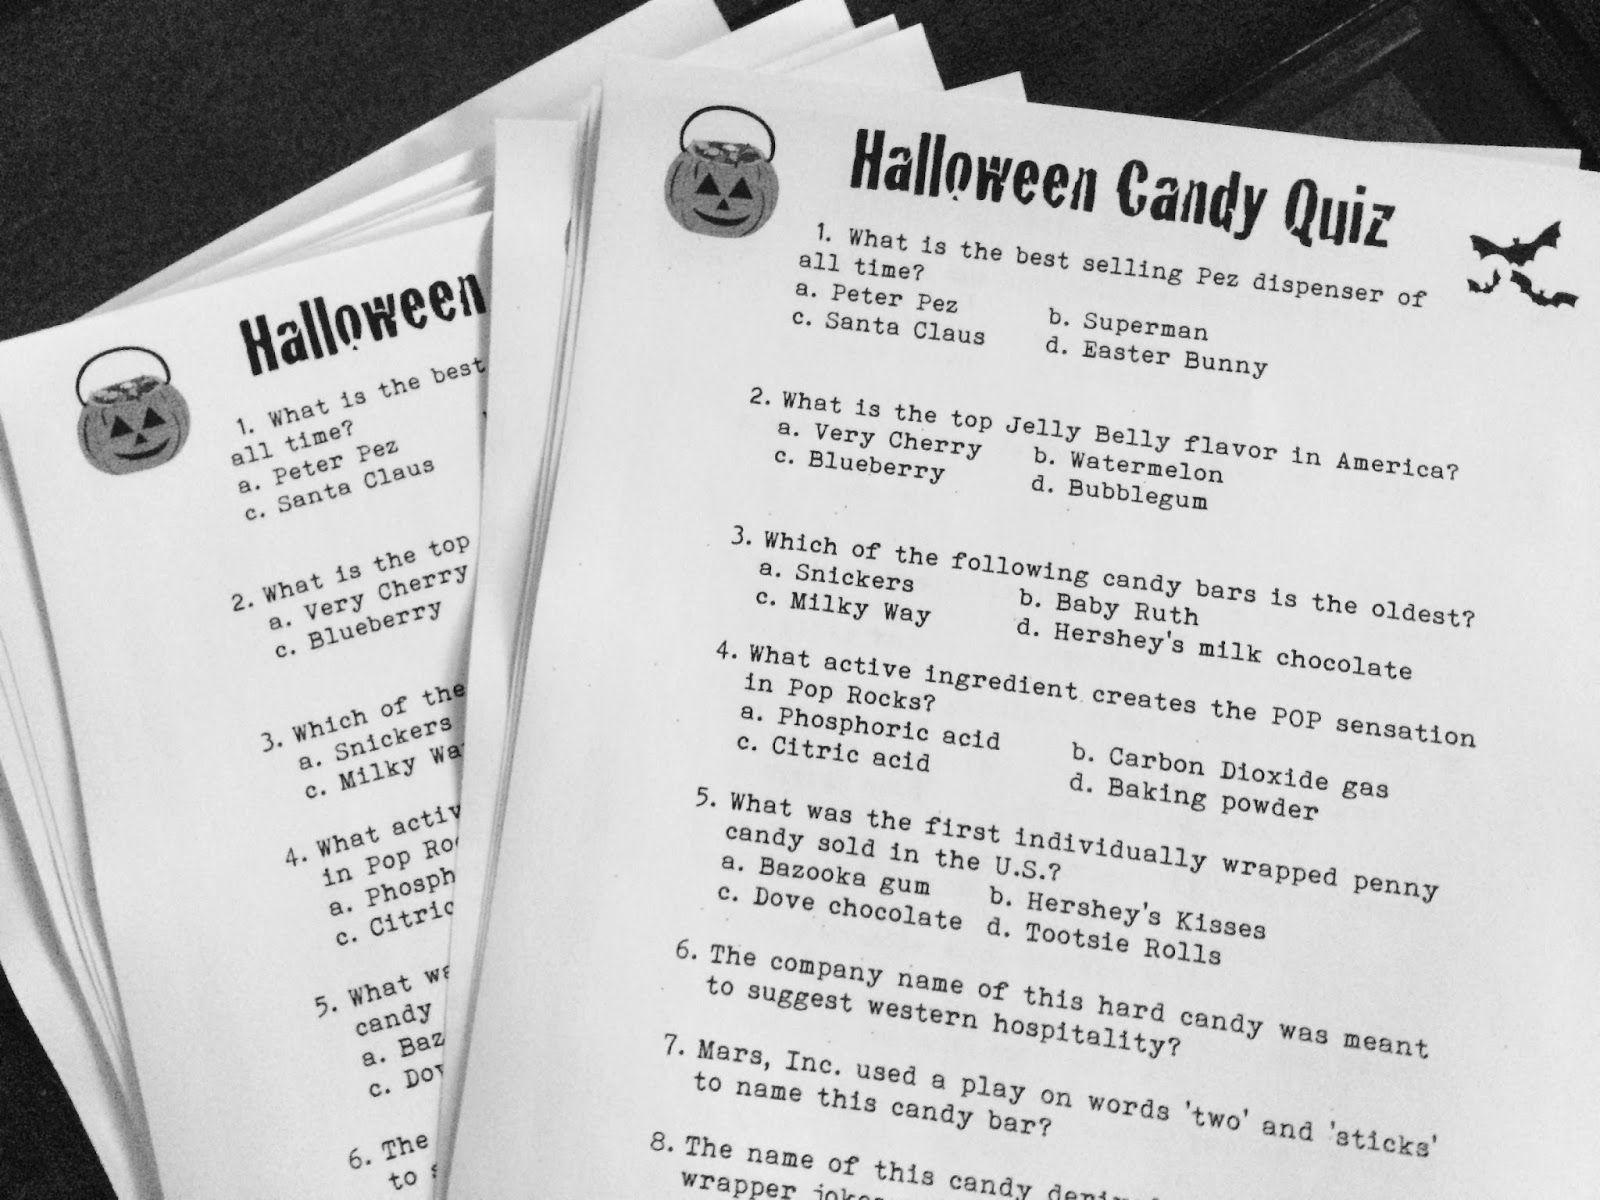 marci coombs halloween candy quiz 2015